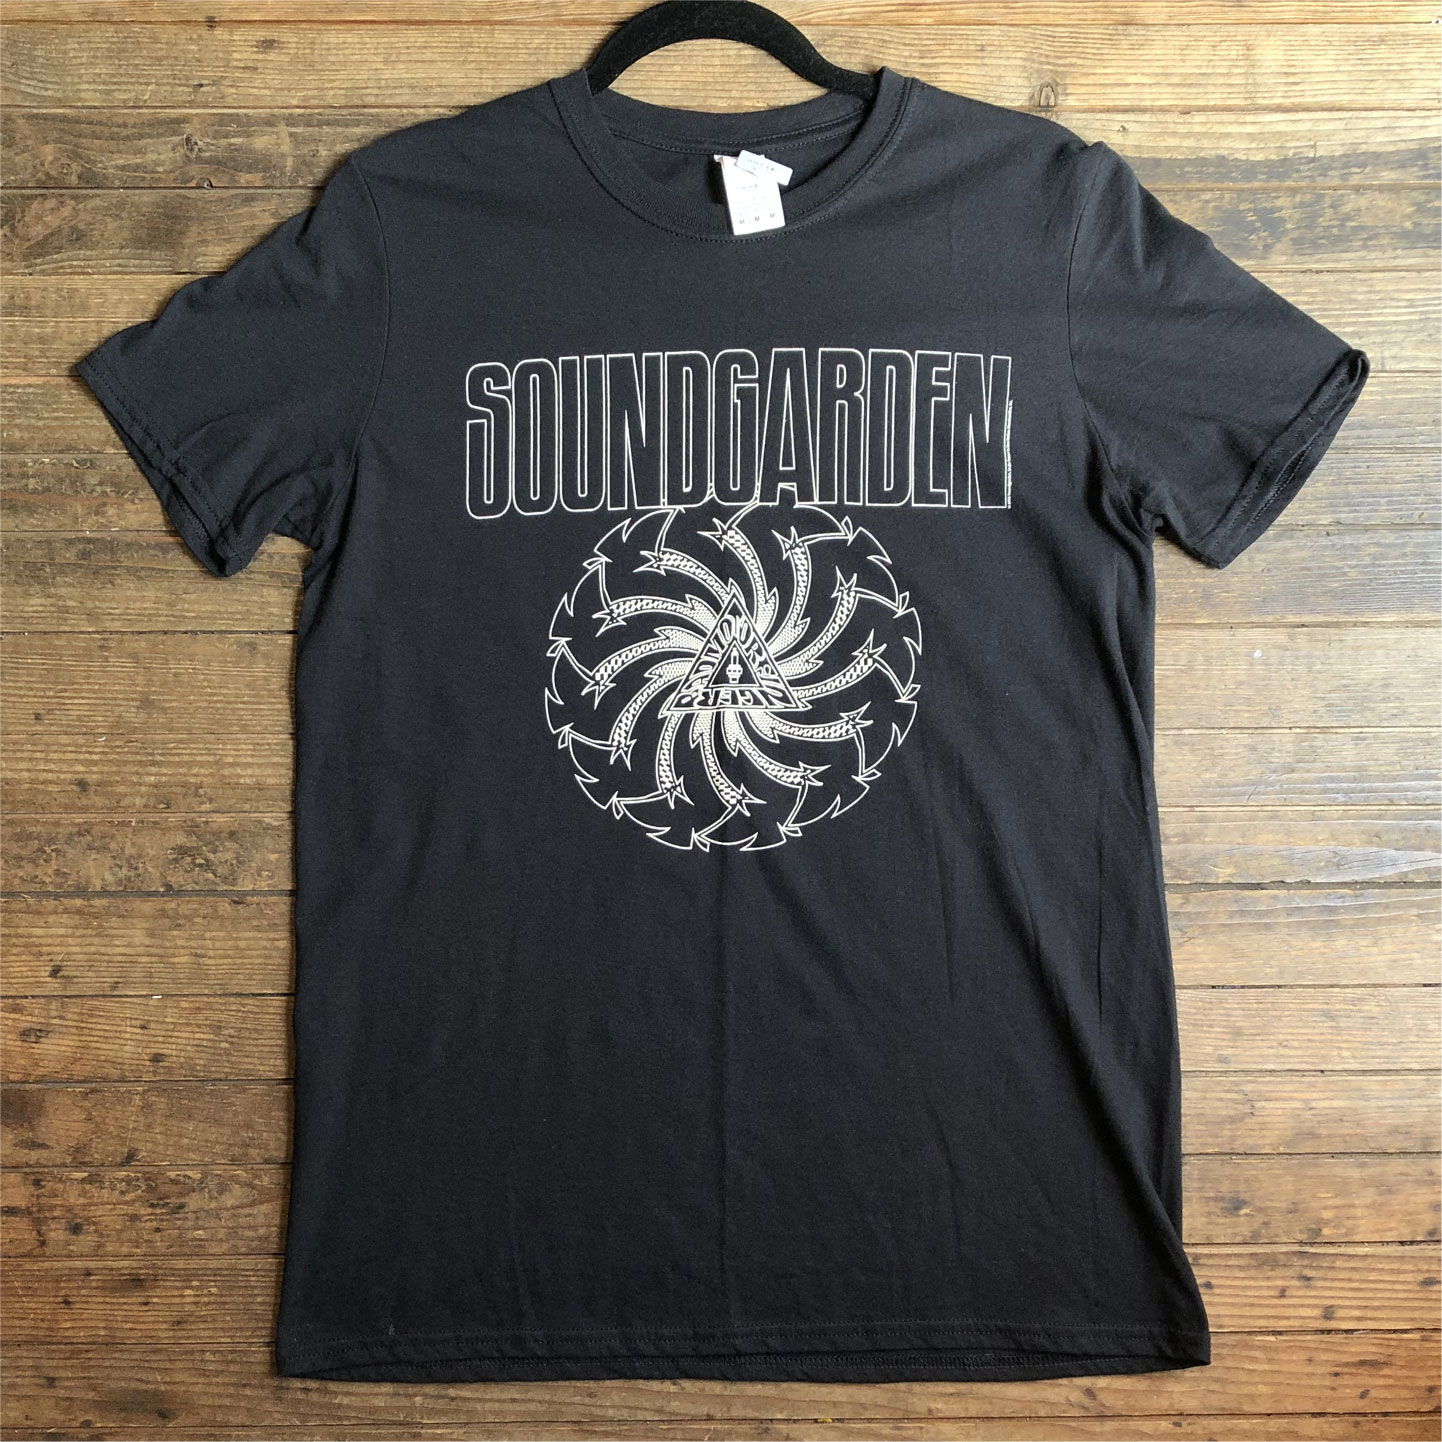 USED! SOUNDGARDEN Tシャツ